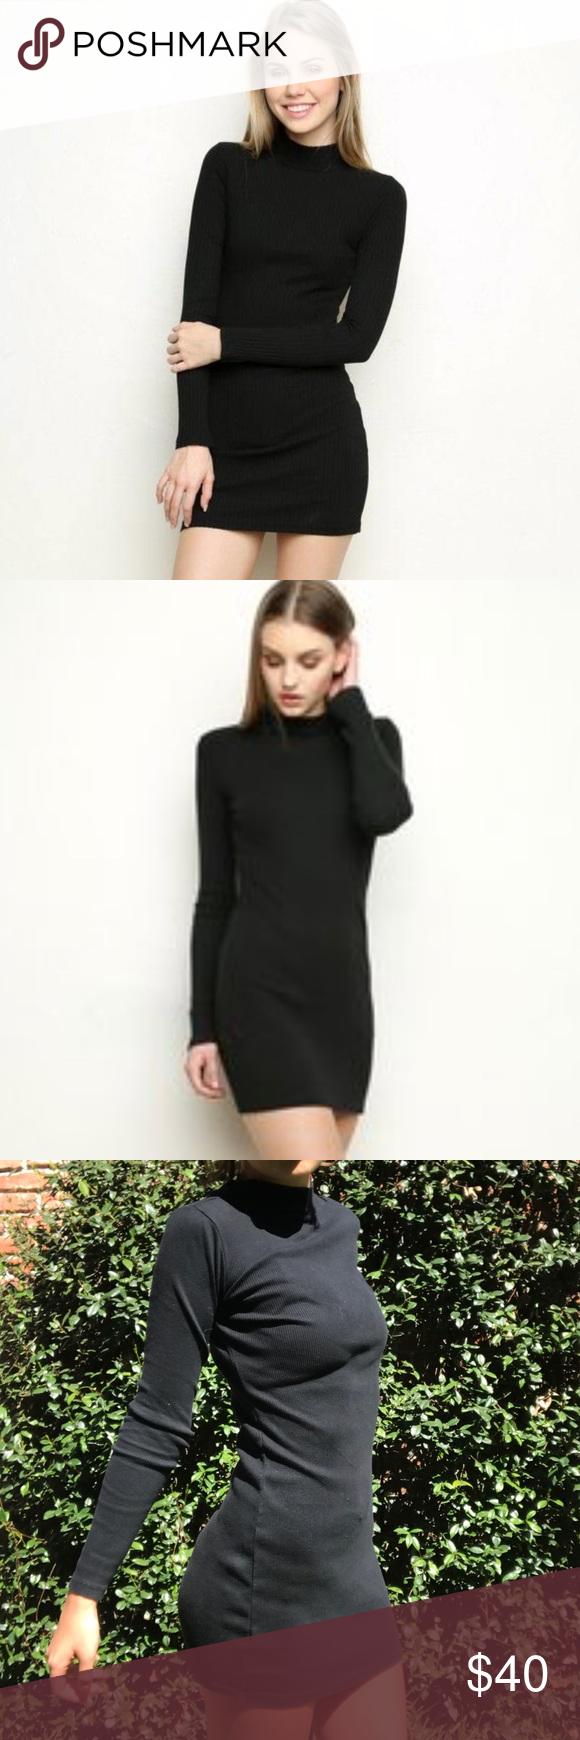 Brandy melville black menina turtleneck dress rare and sold out has